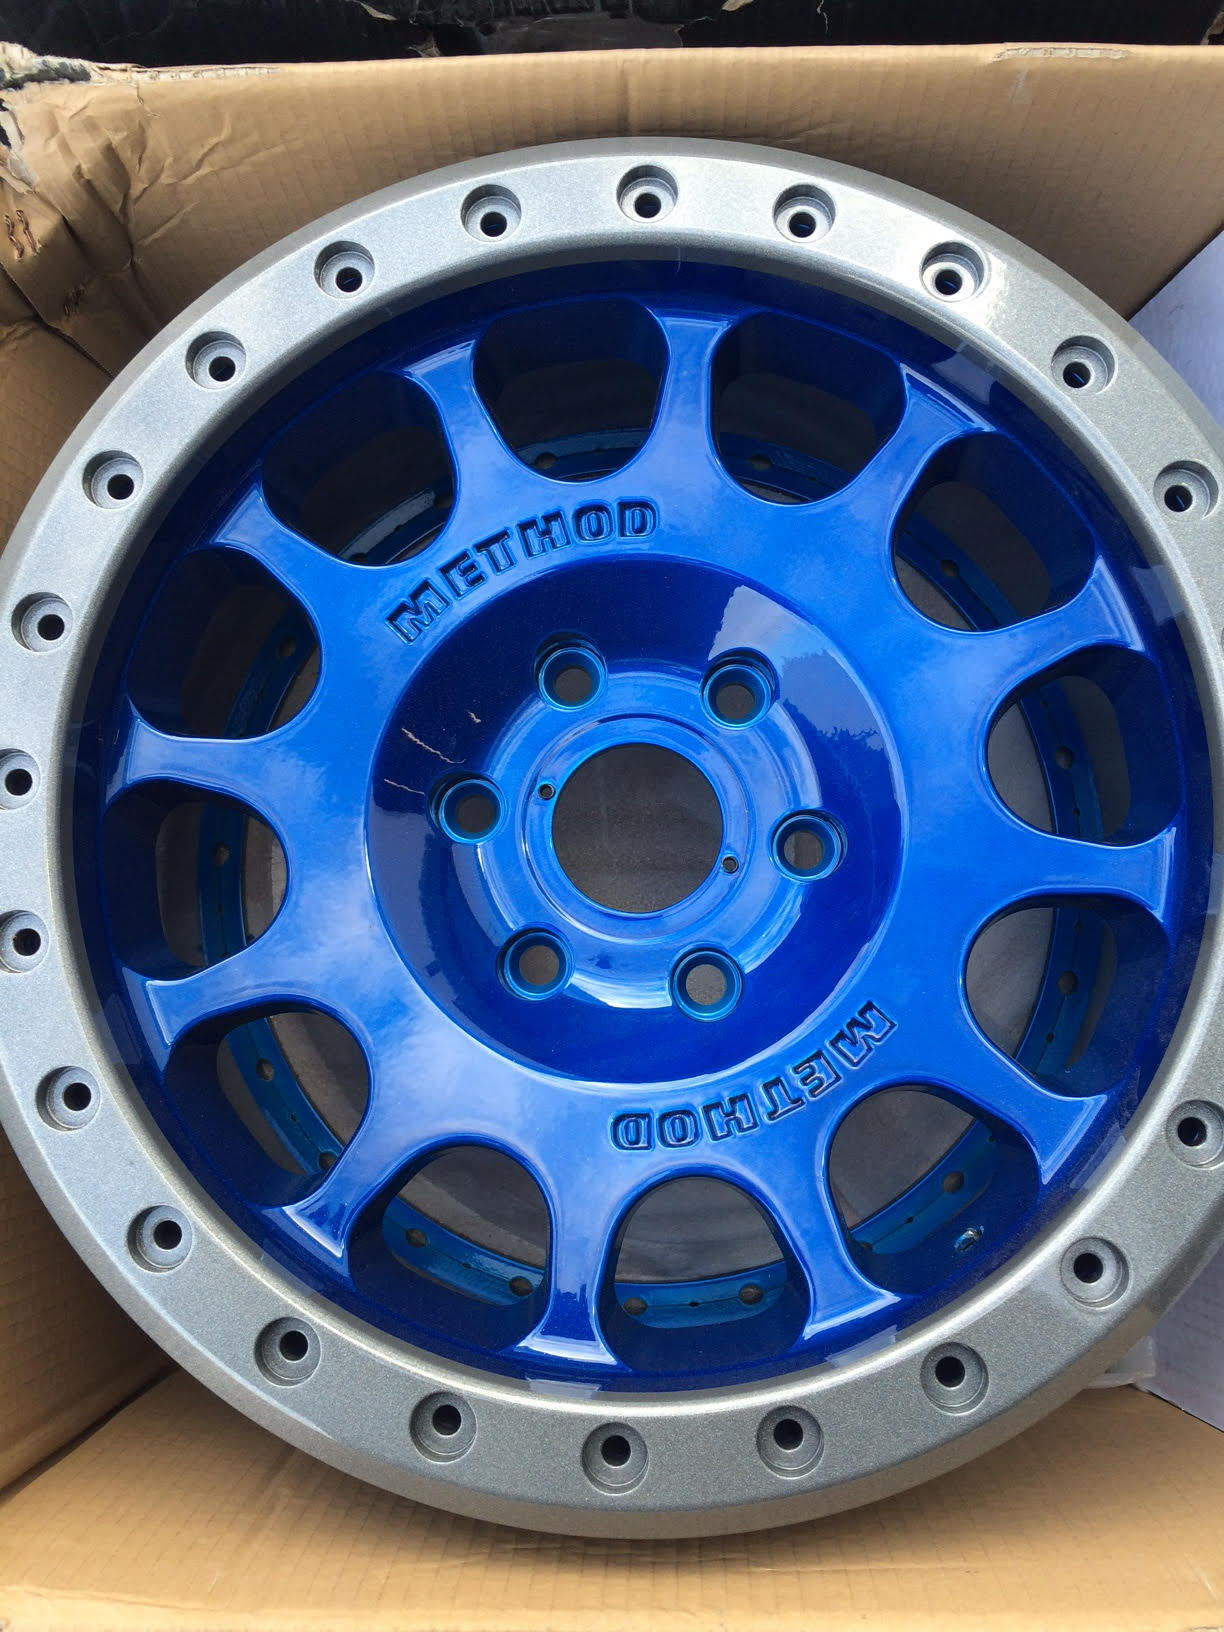 Custom F150 Wheels >> Southwest 17x8.5 Method 105 Beadlock Wheels!! - Ford F150 Forum - Community of Ford Truck Fans